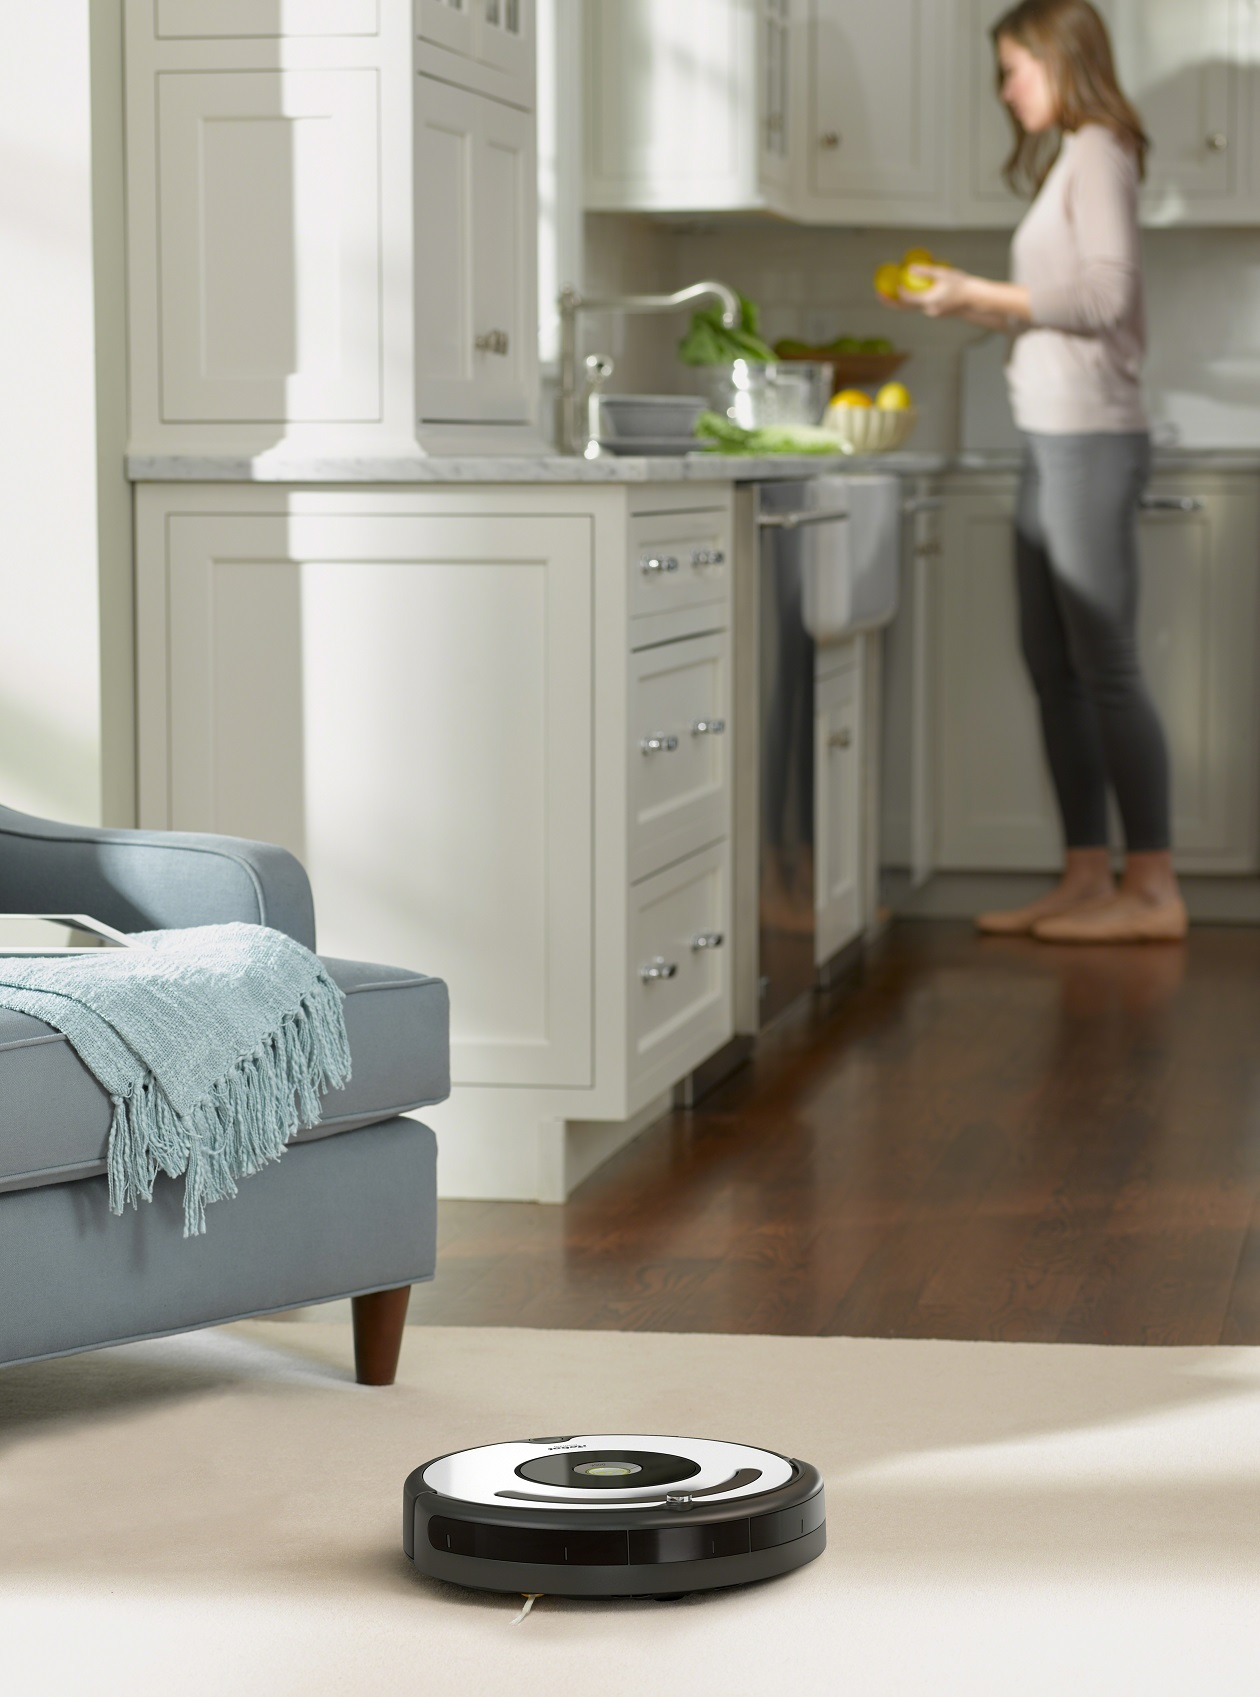 iRobot Roomba 605 robotický vysavaè